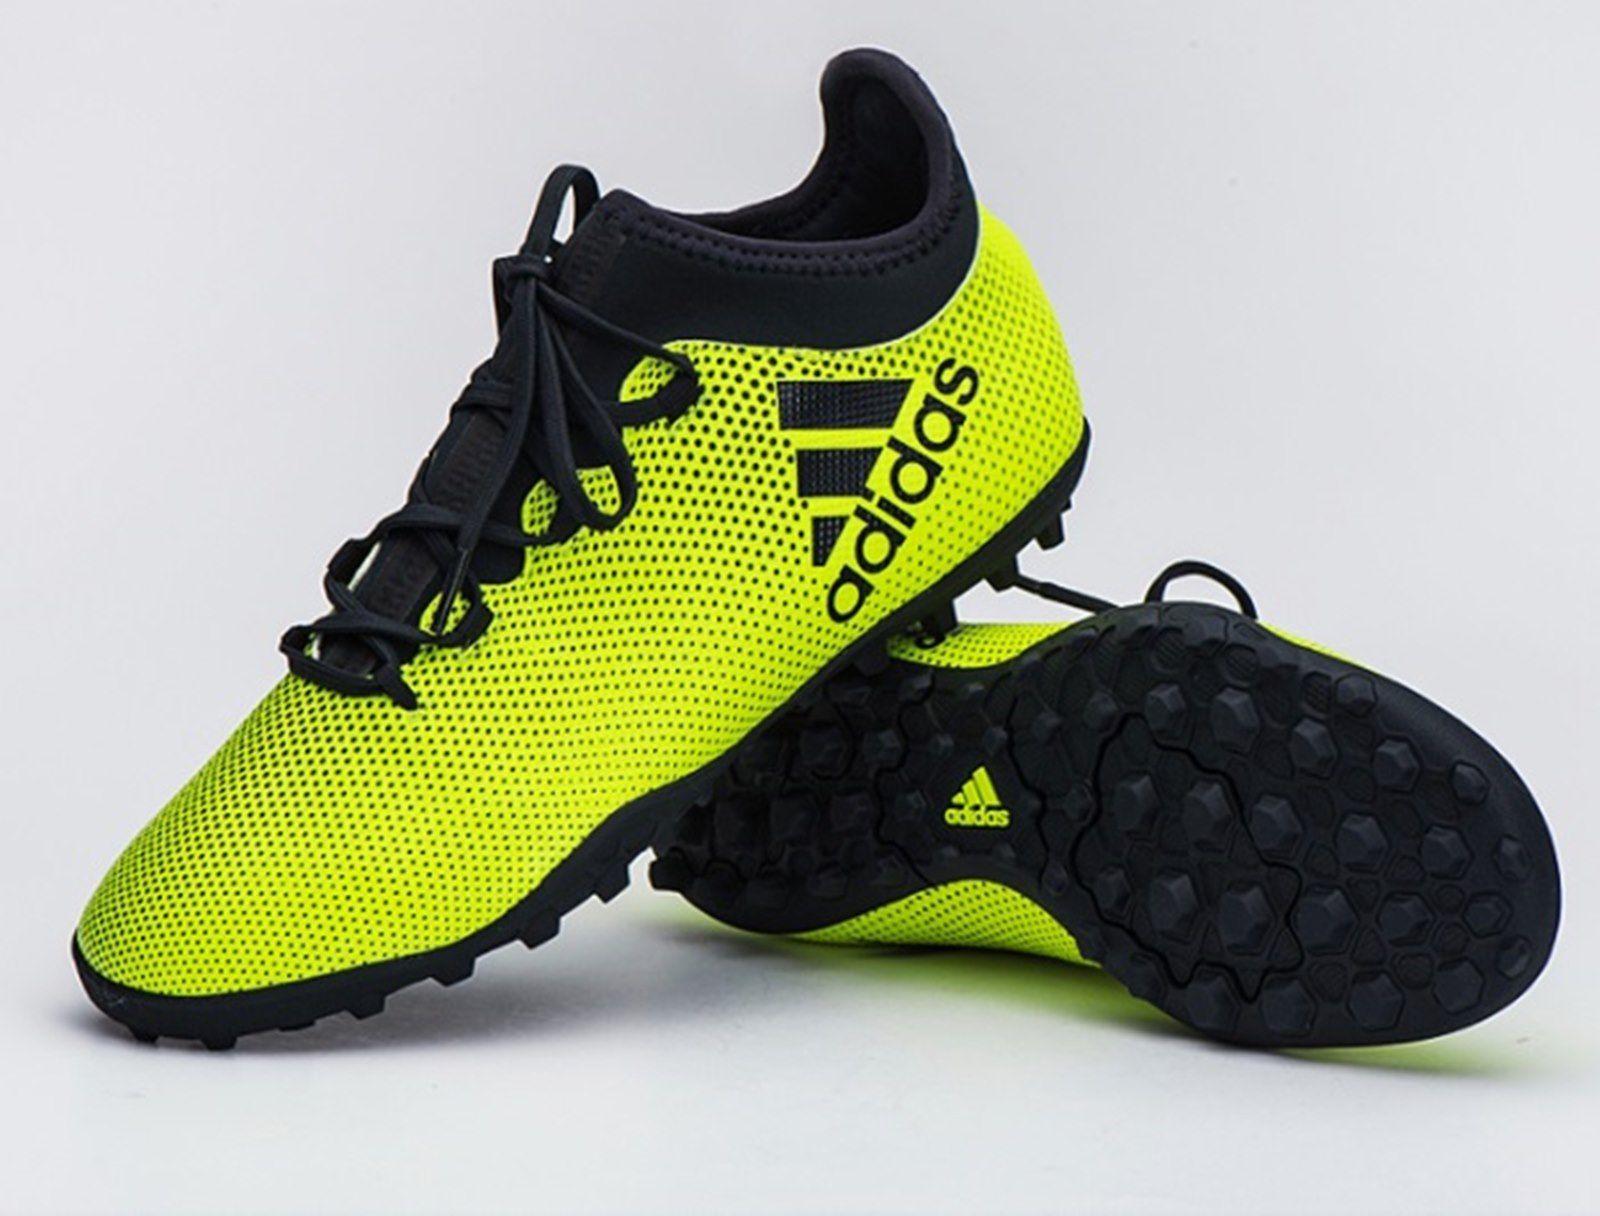 best website f98e6 67ea6 Kapada: Adidas Green X Tango 17.3 Turf Football Shoes For Men - CG3727